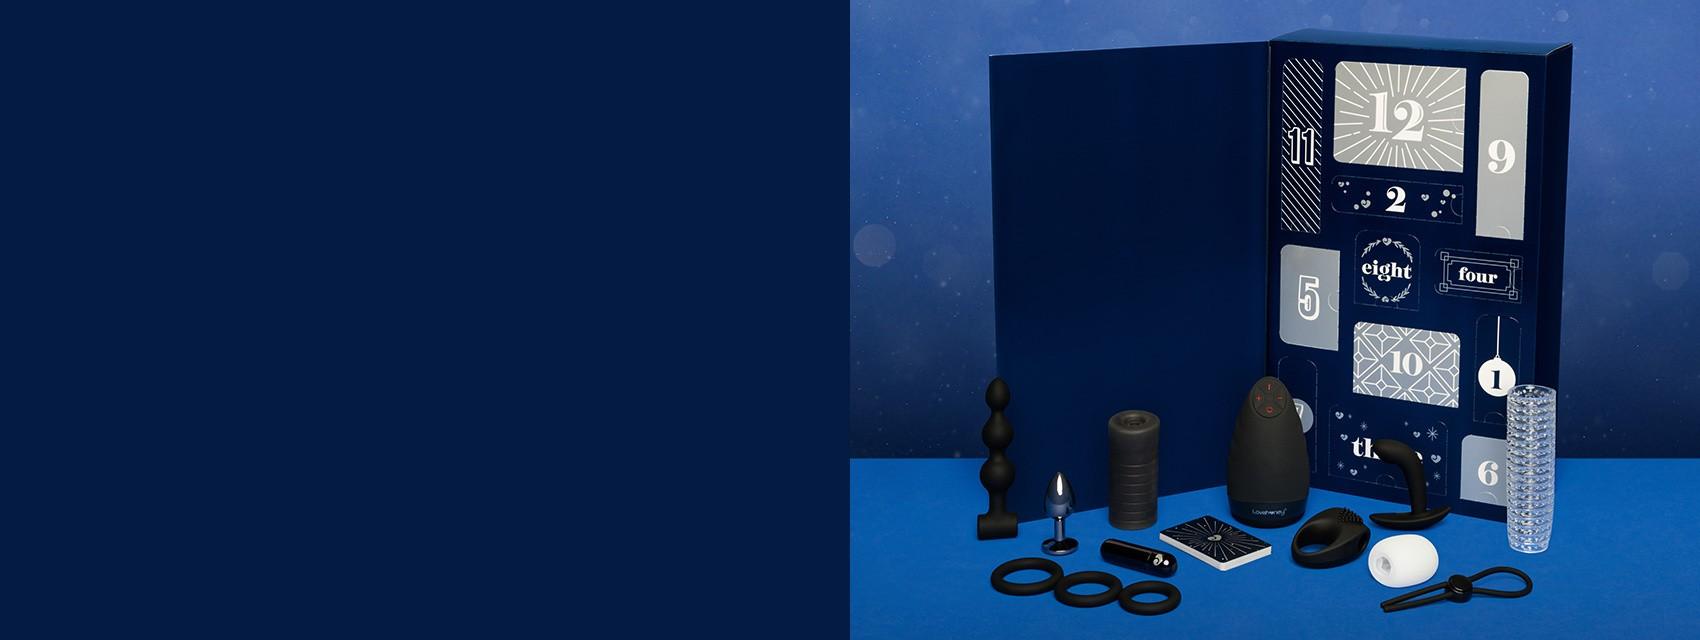 Desktop-Advent-Calendar-For-Him-3